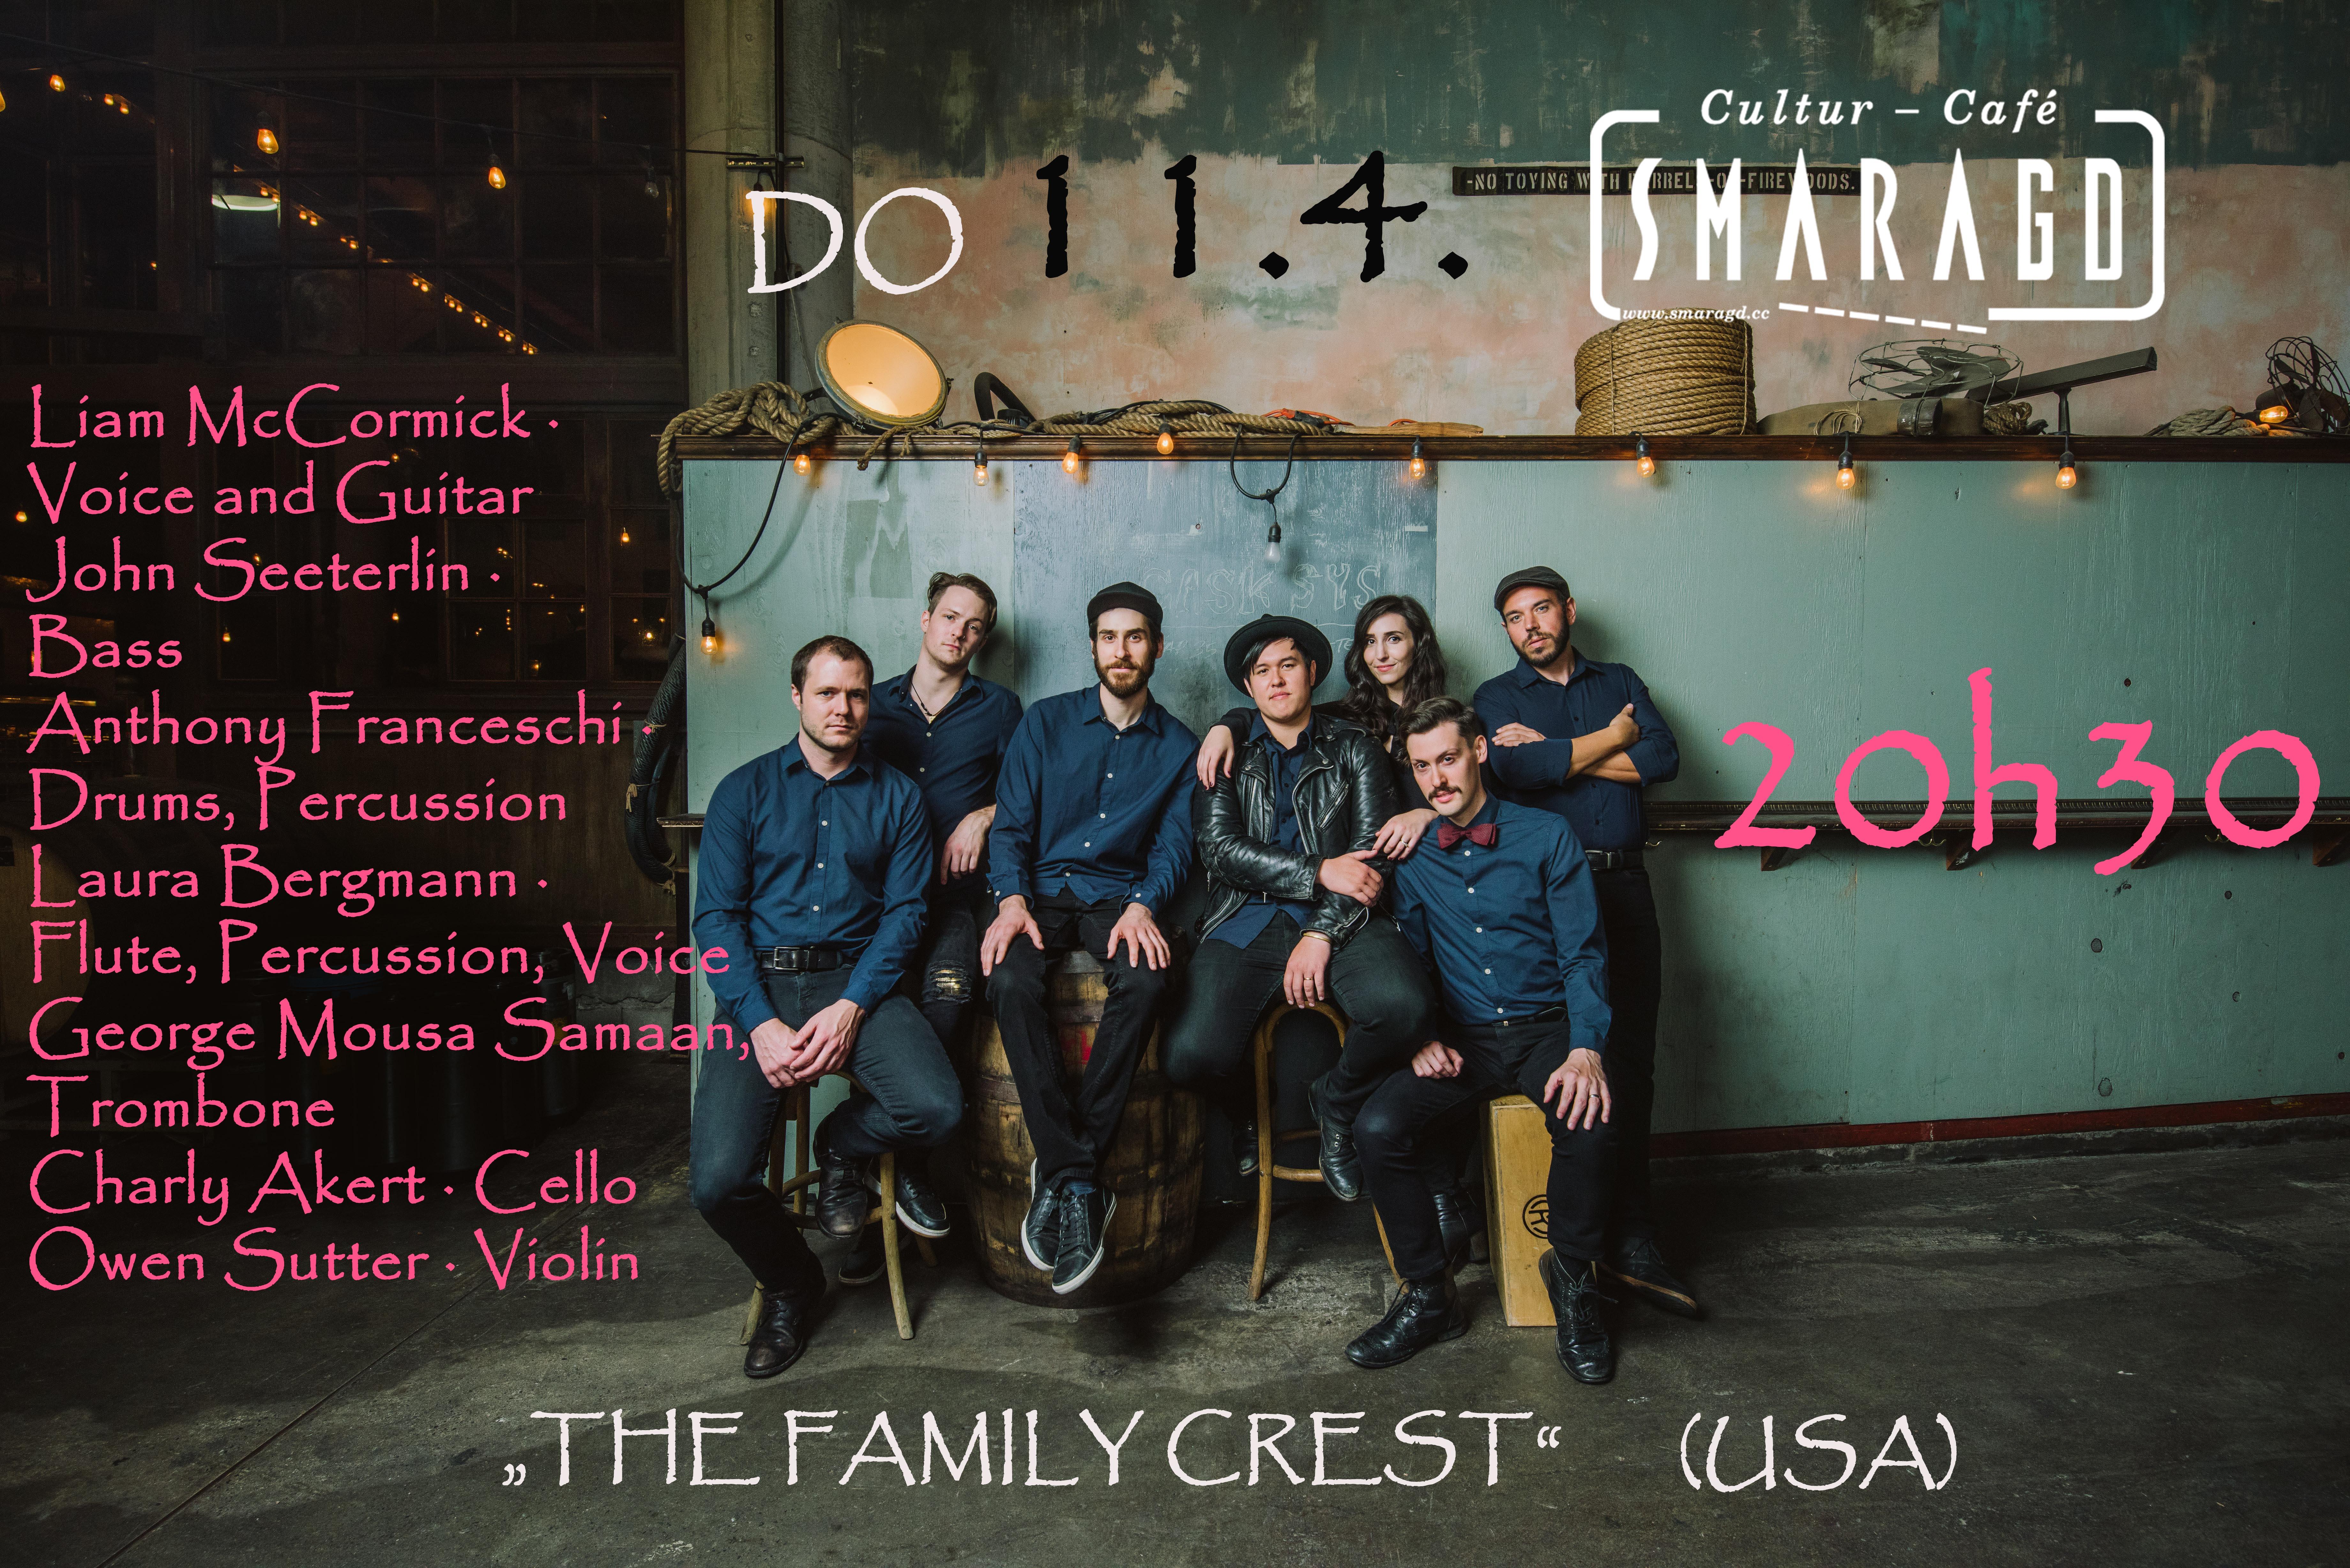 ccsmaragd-linz-familycrest